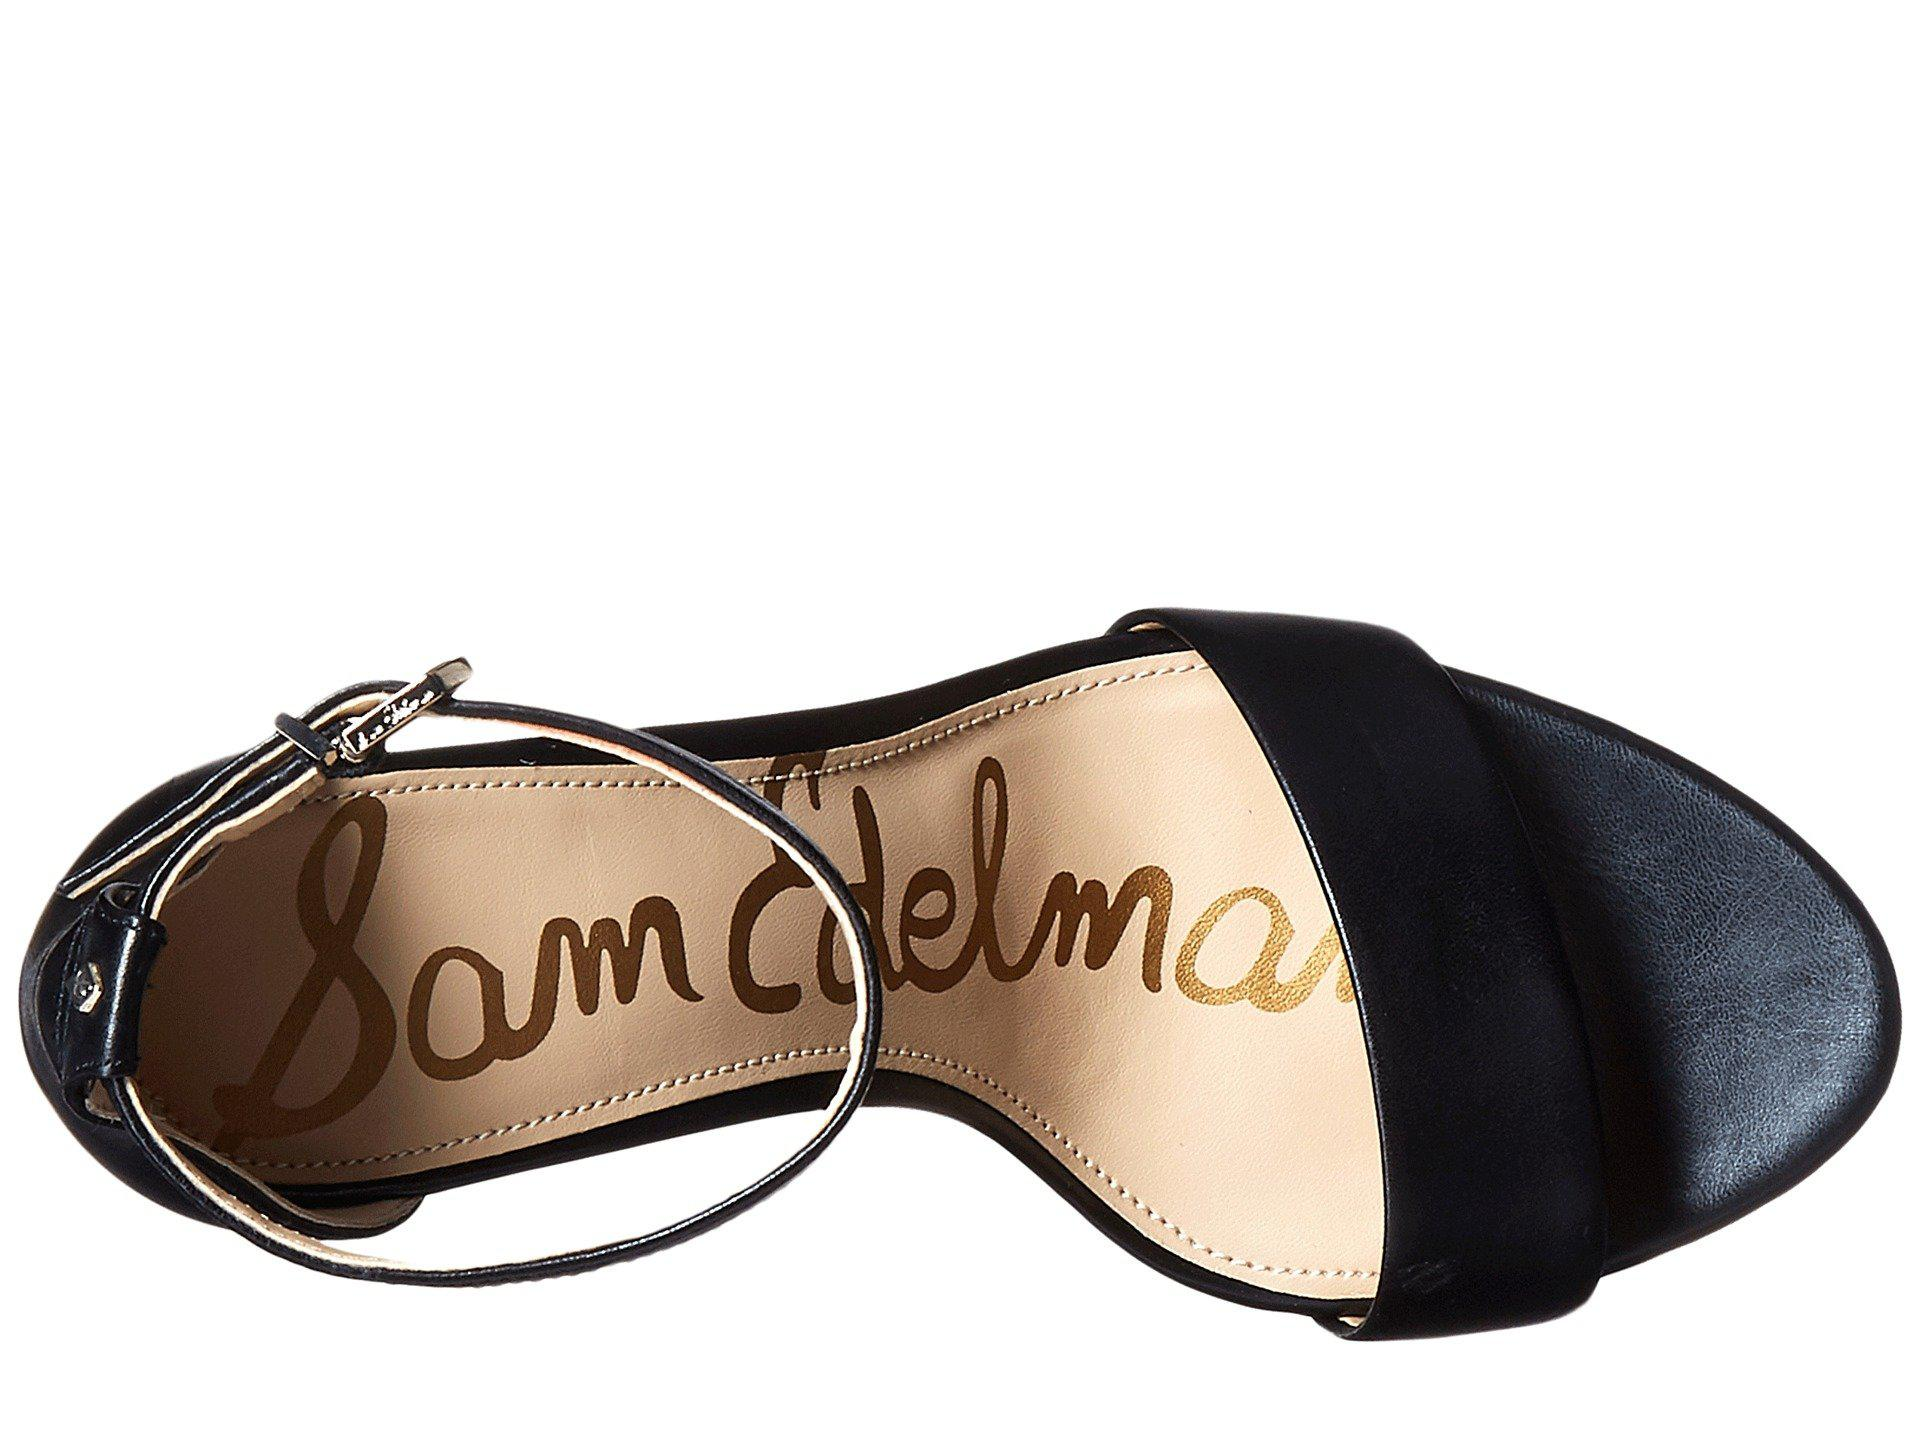 664b8e998beb Lyst - Sam Edelman Yaro Suede Block-heel Sandals in Black - Save 45%